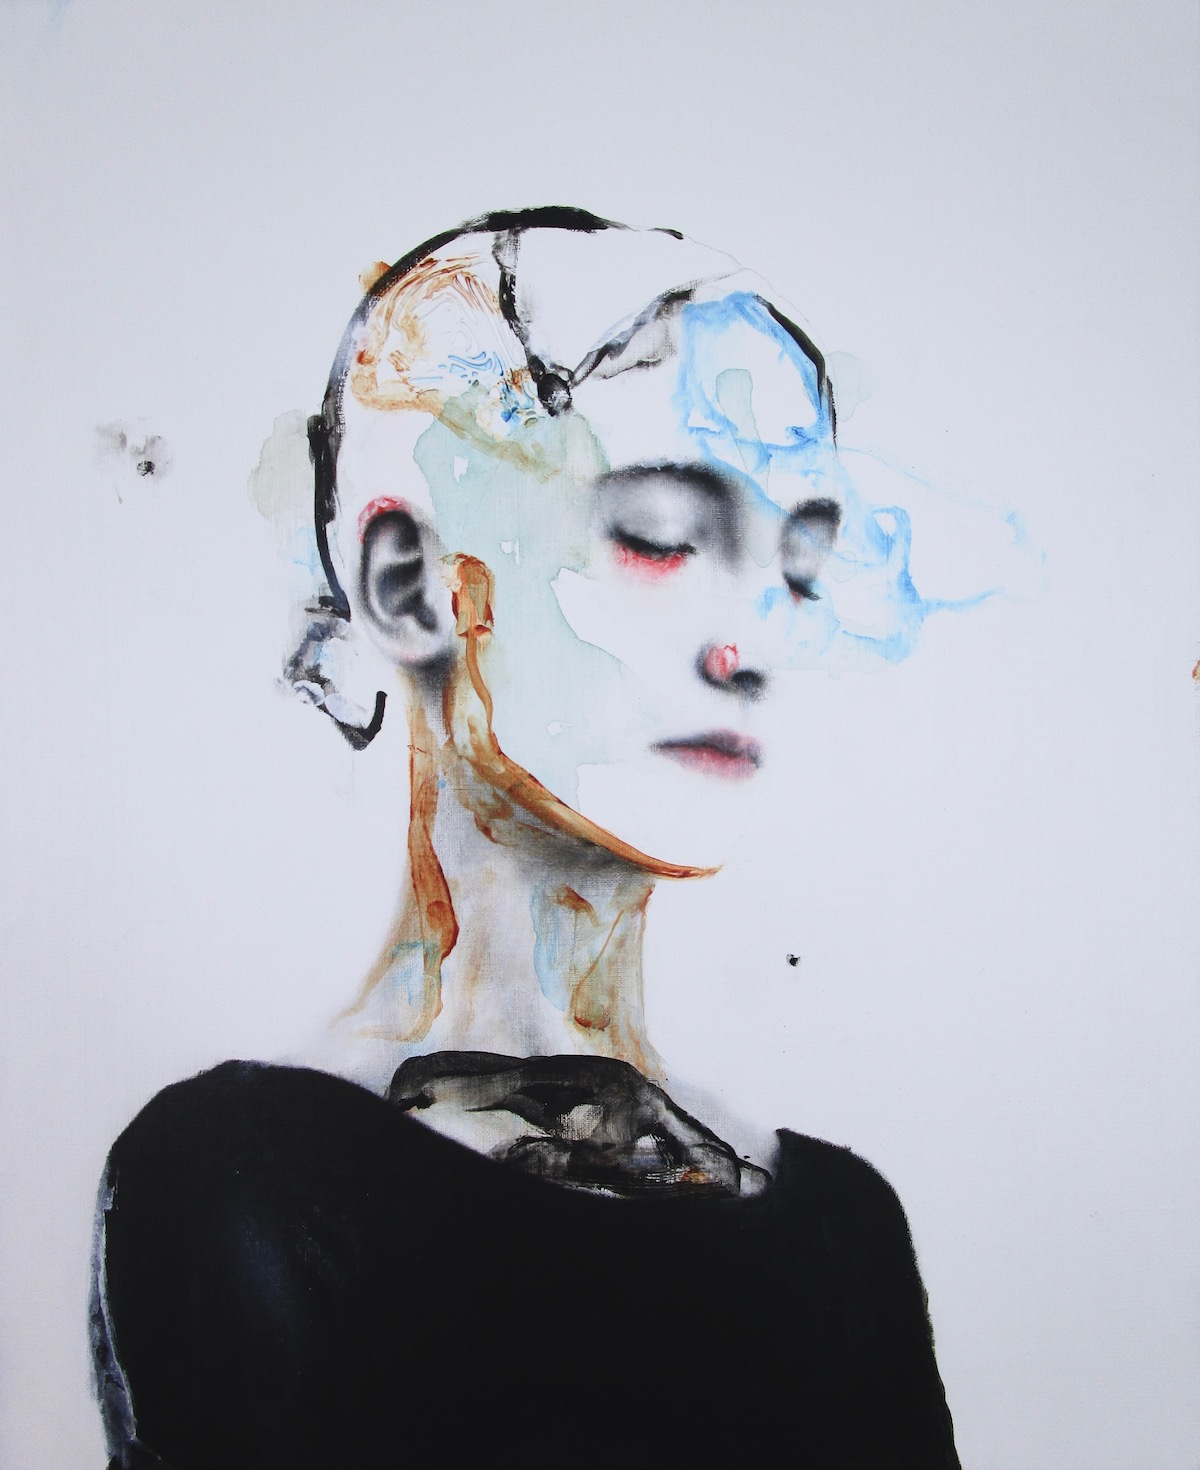 antoine cordet canvas toile peinture painting portrait art artist artiste peintre acrylic oil liquid bell